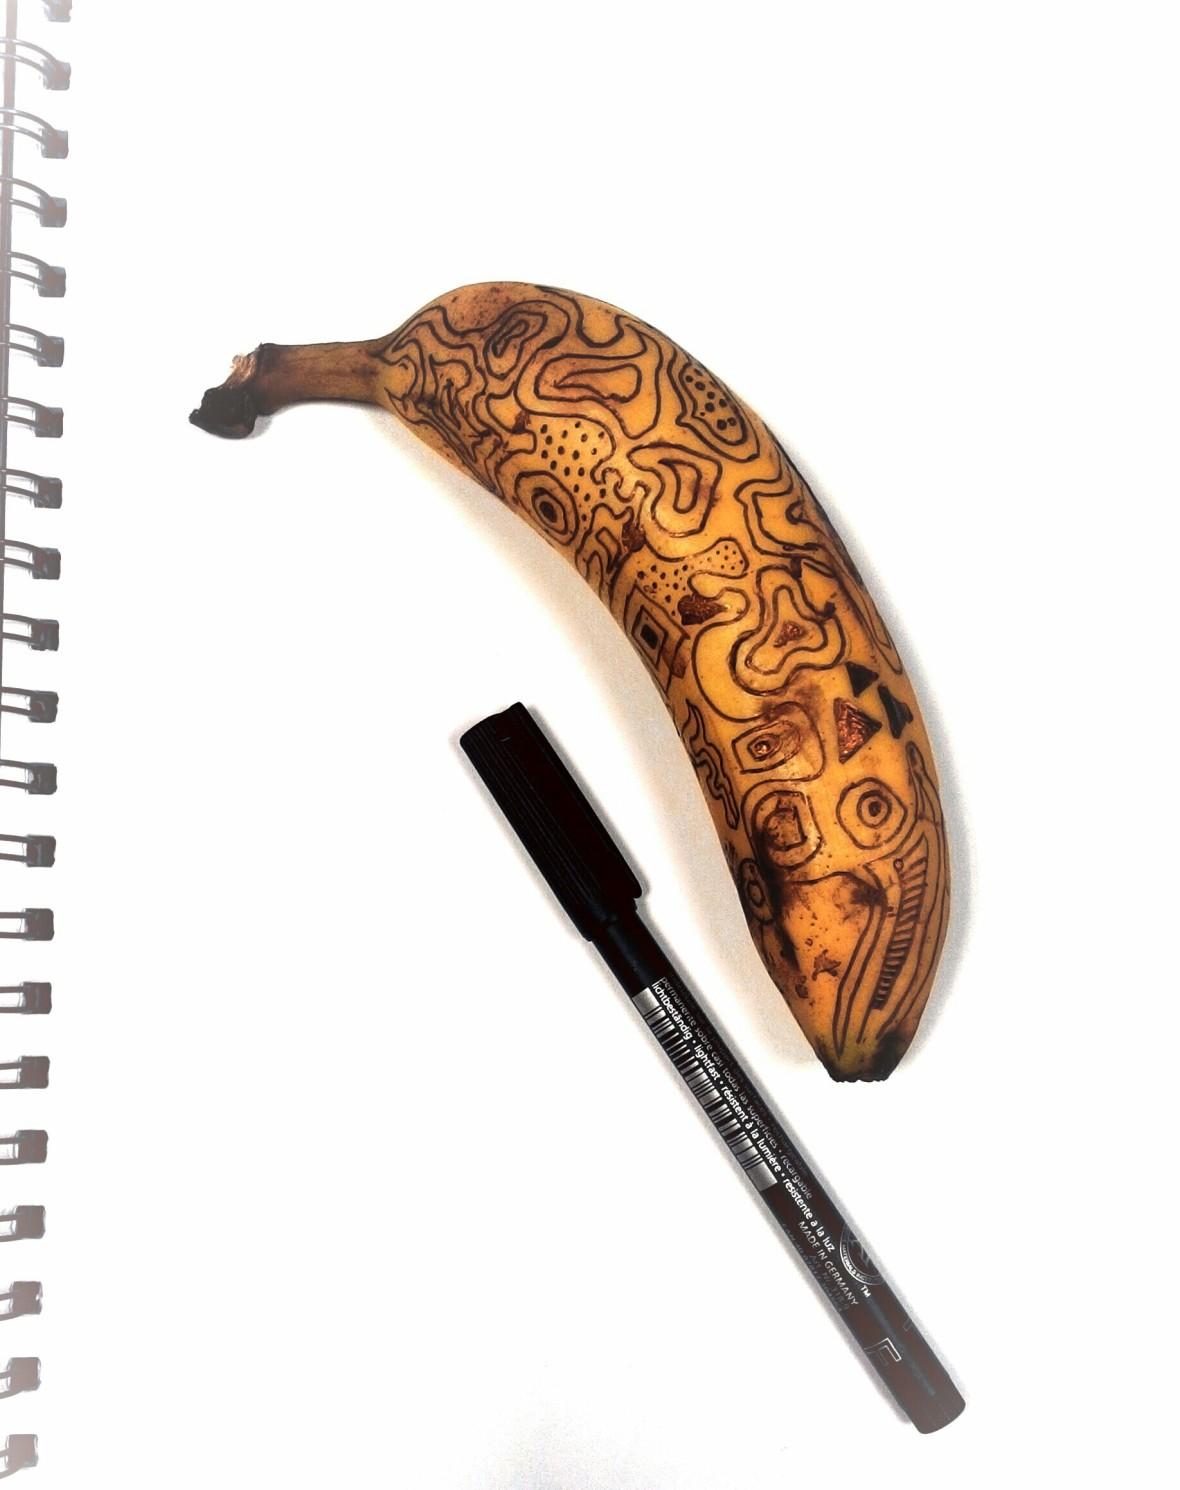 Art - Banana